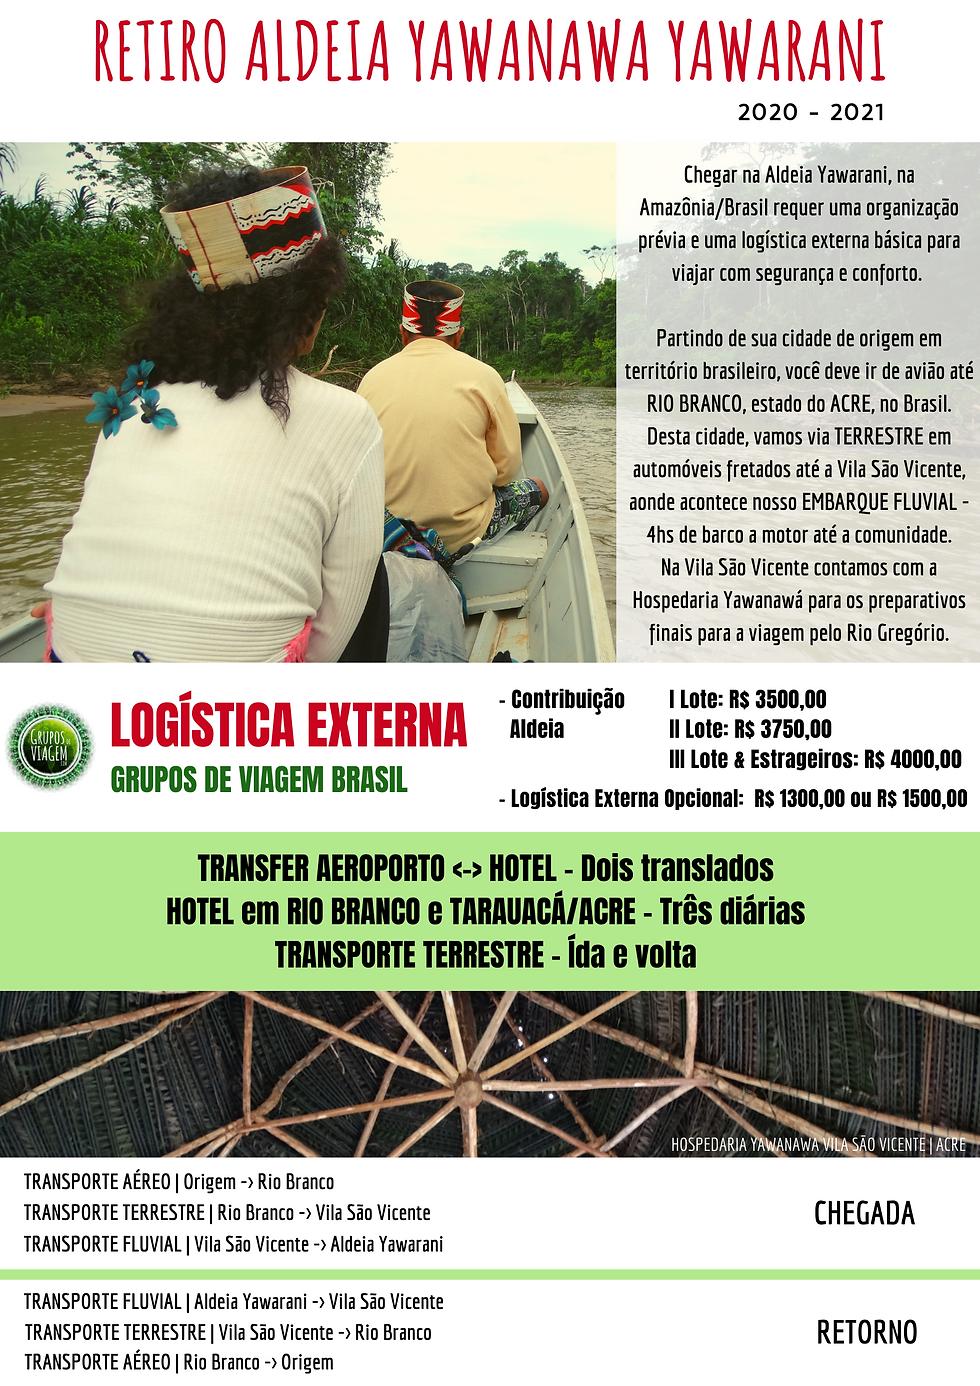 LOGÍSTICAS_EXTERNA_GVBR.png